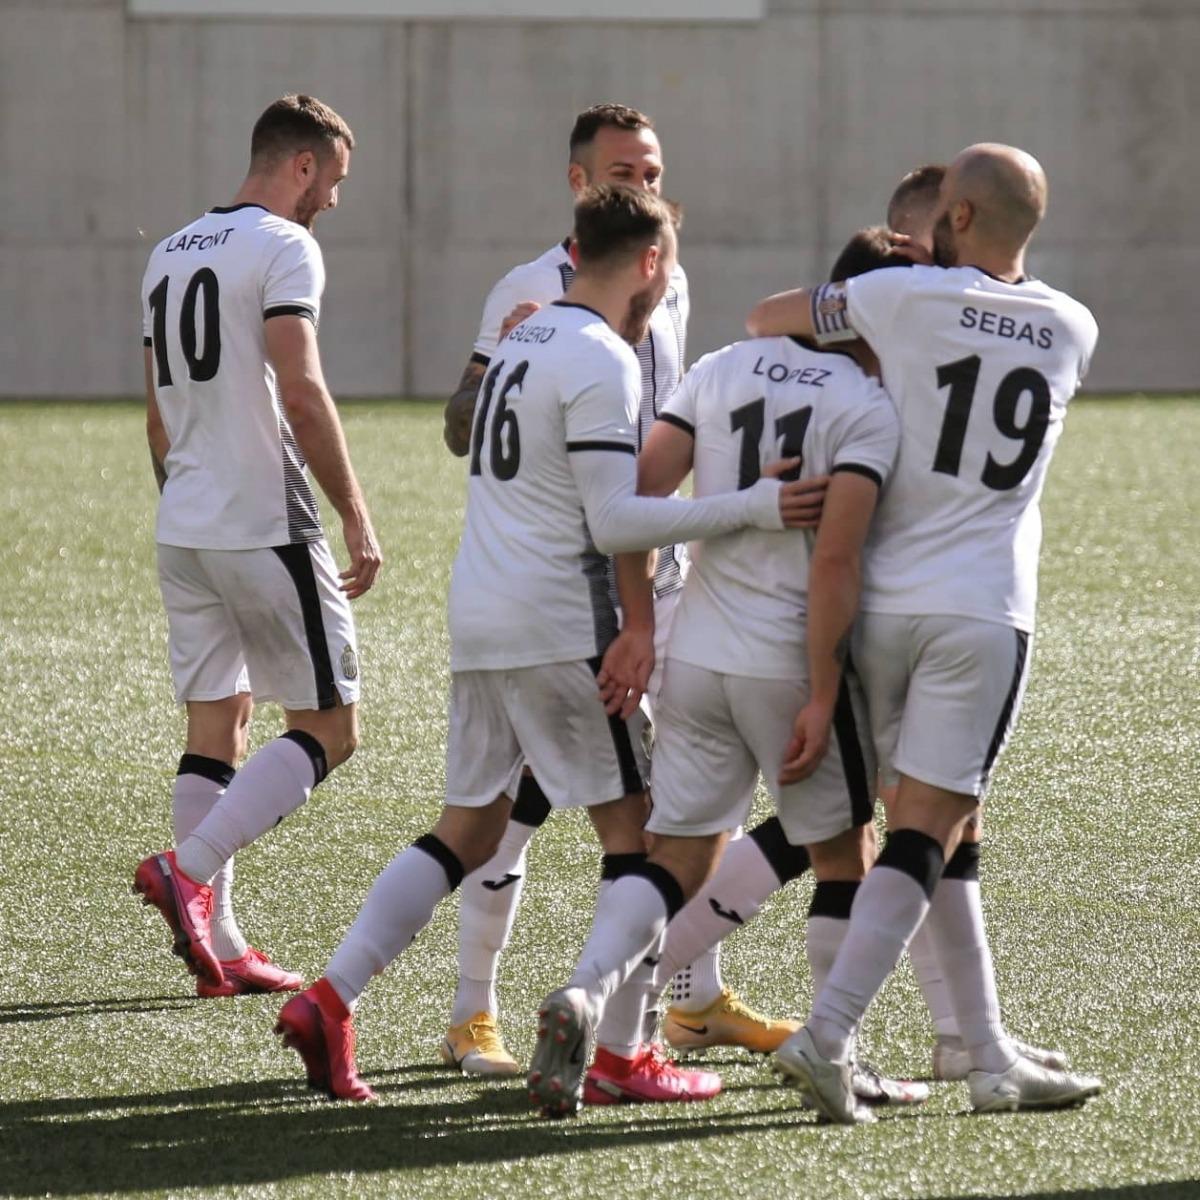 Sebas Gómez i Guillaume López celebren un gol la temporada passada amb la UE Engordany. Foto: Twitter UE Engordany